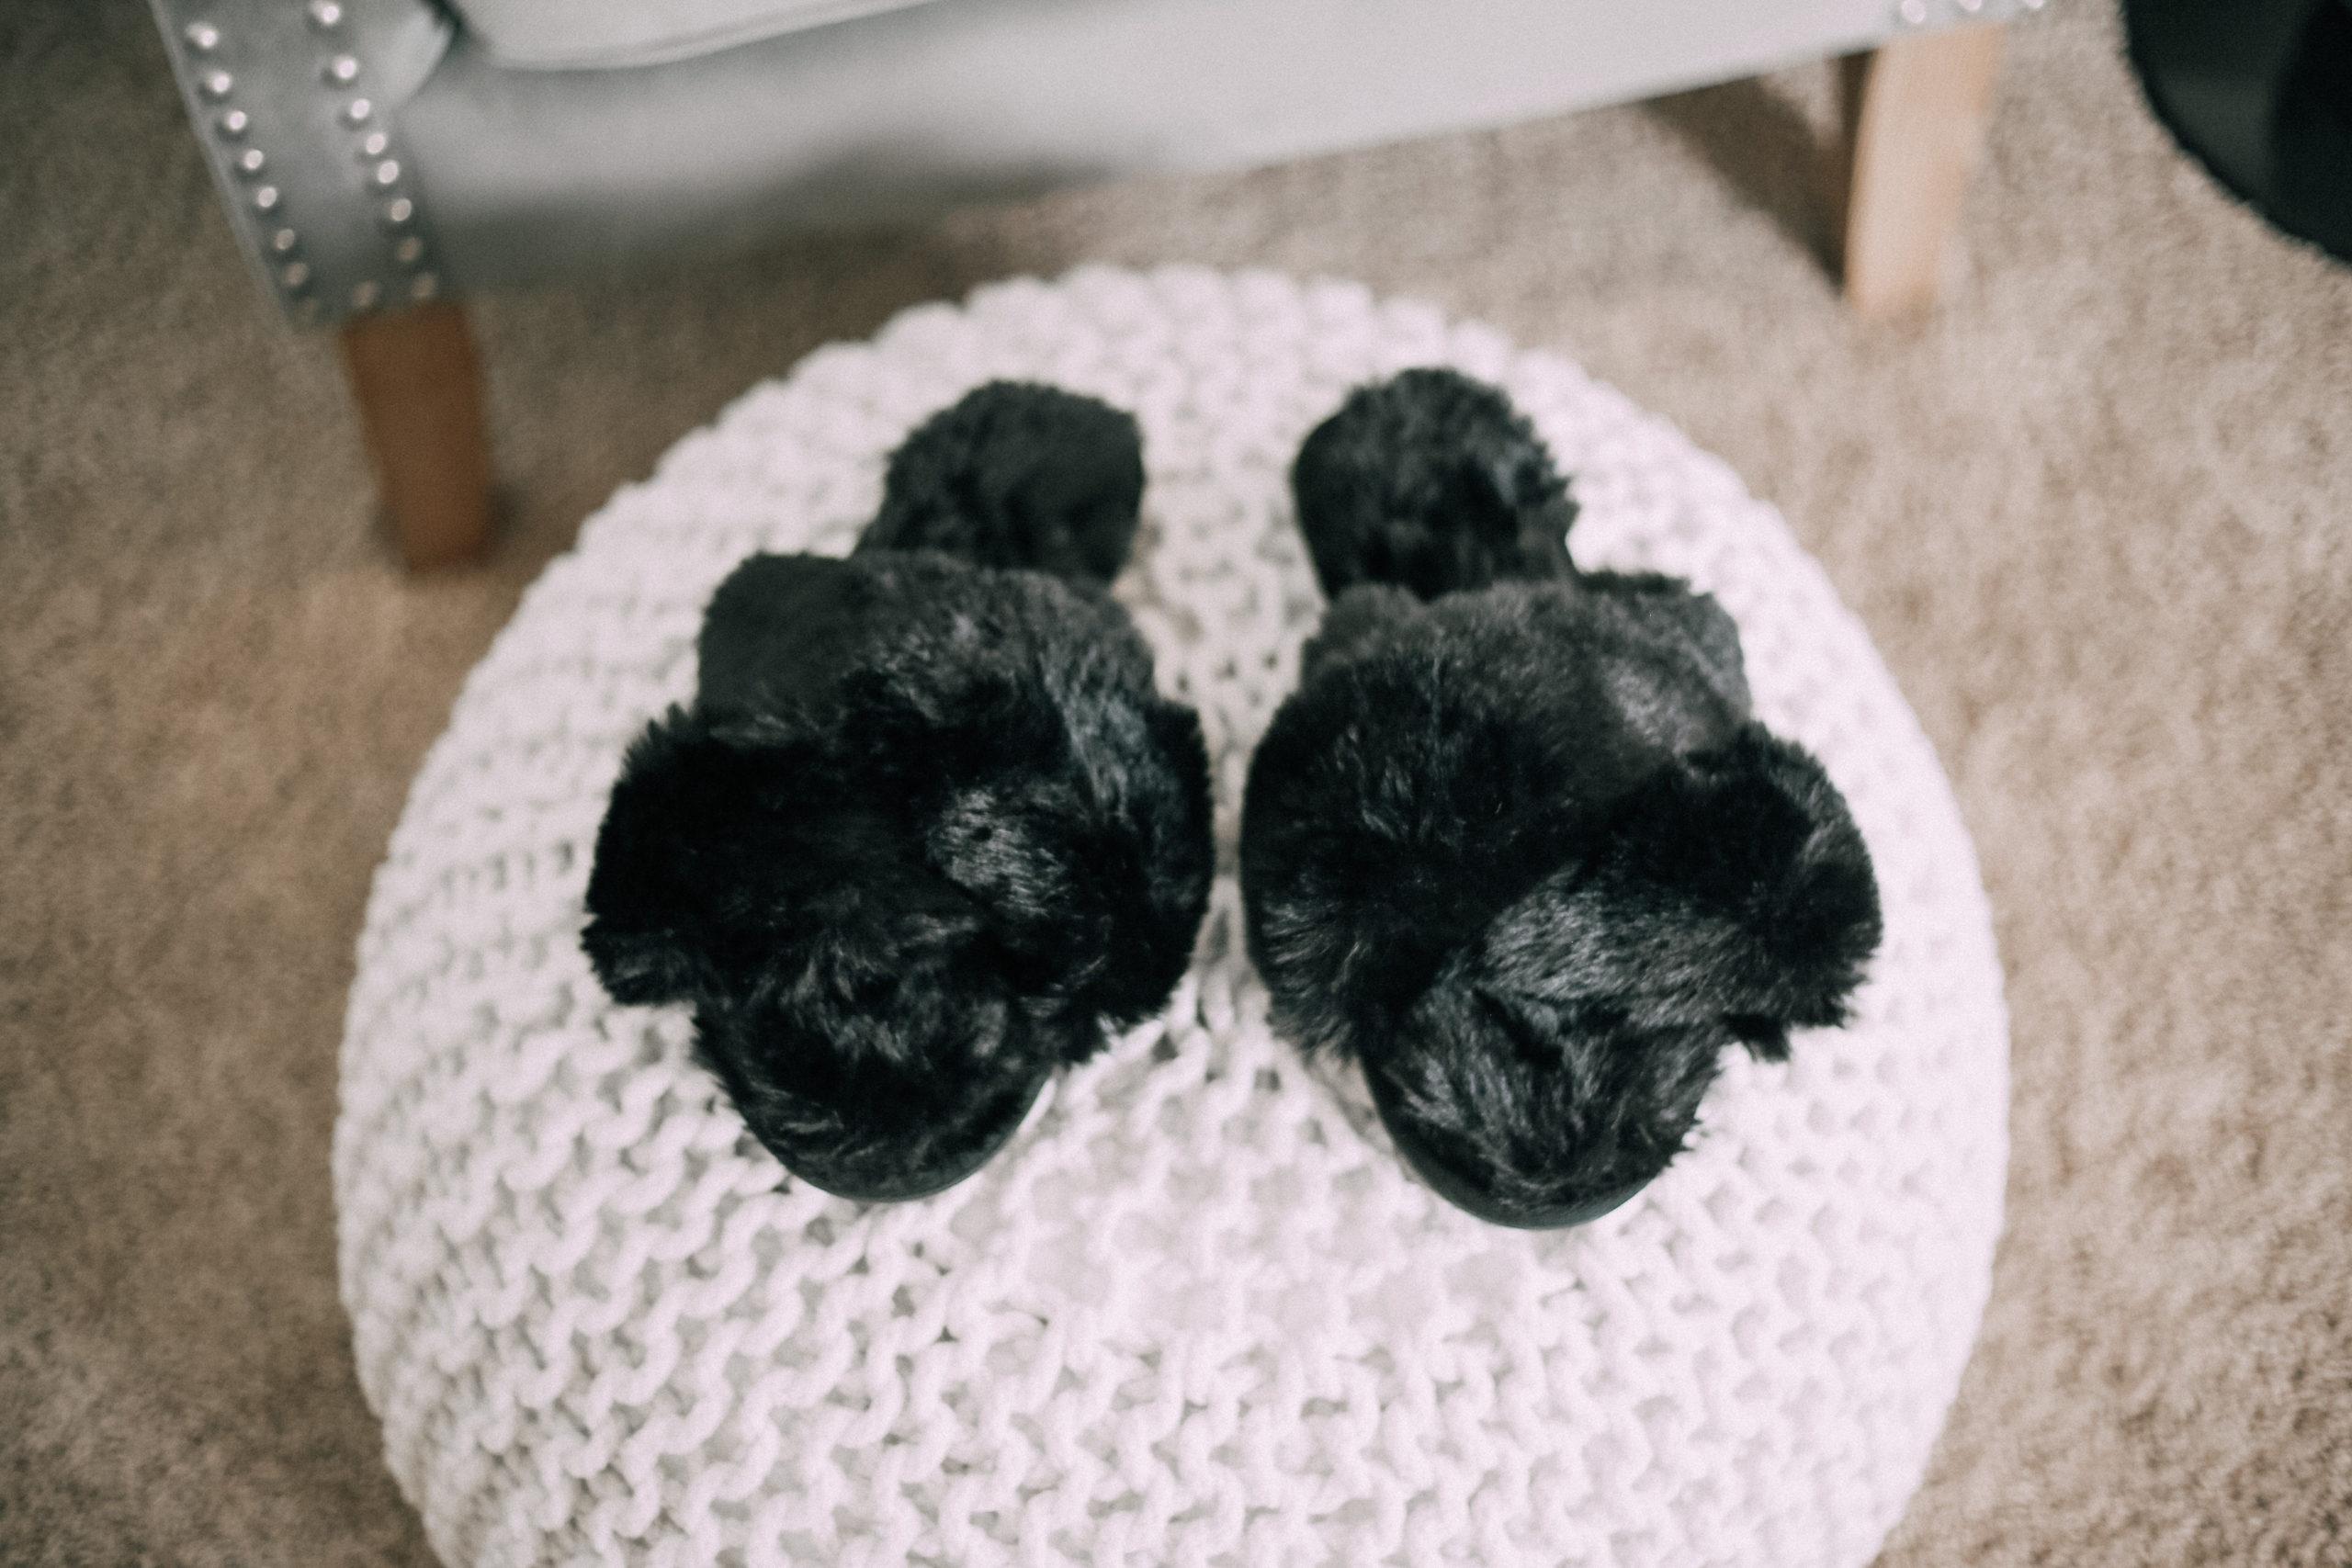 amazon finds, slippers, amazon, amazon prime, fuzzy slippers